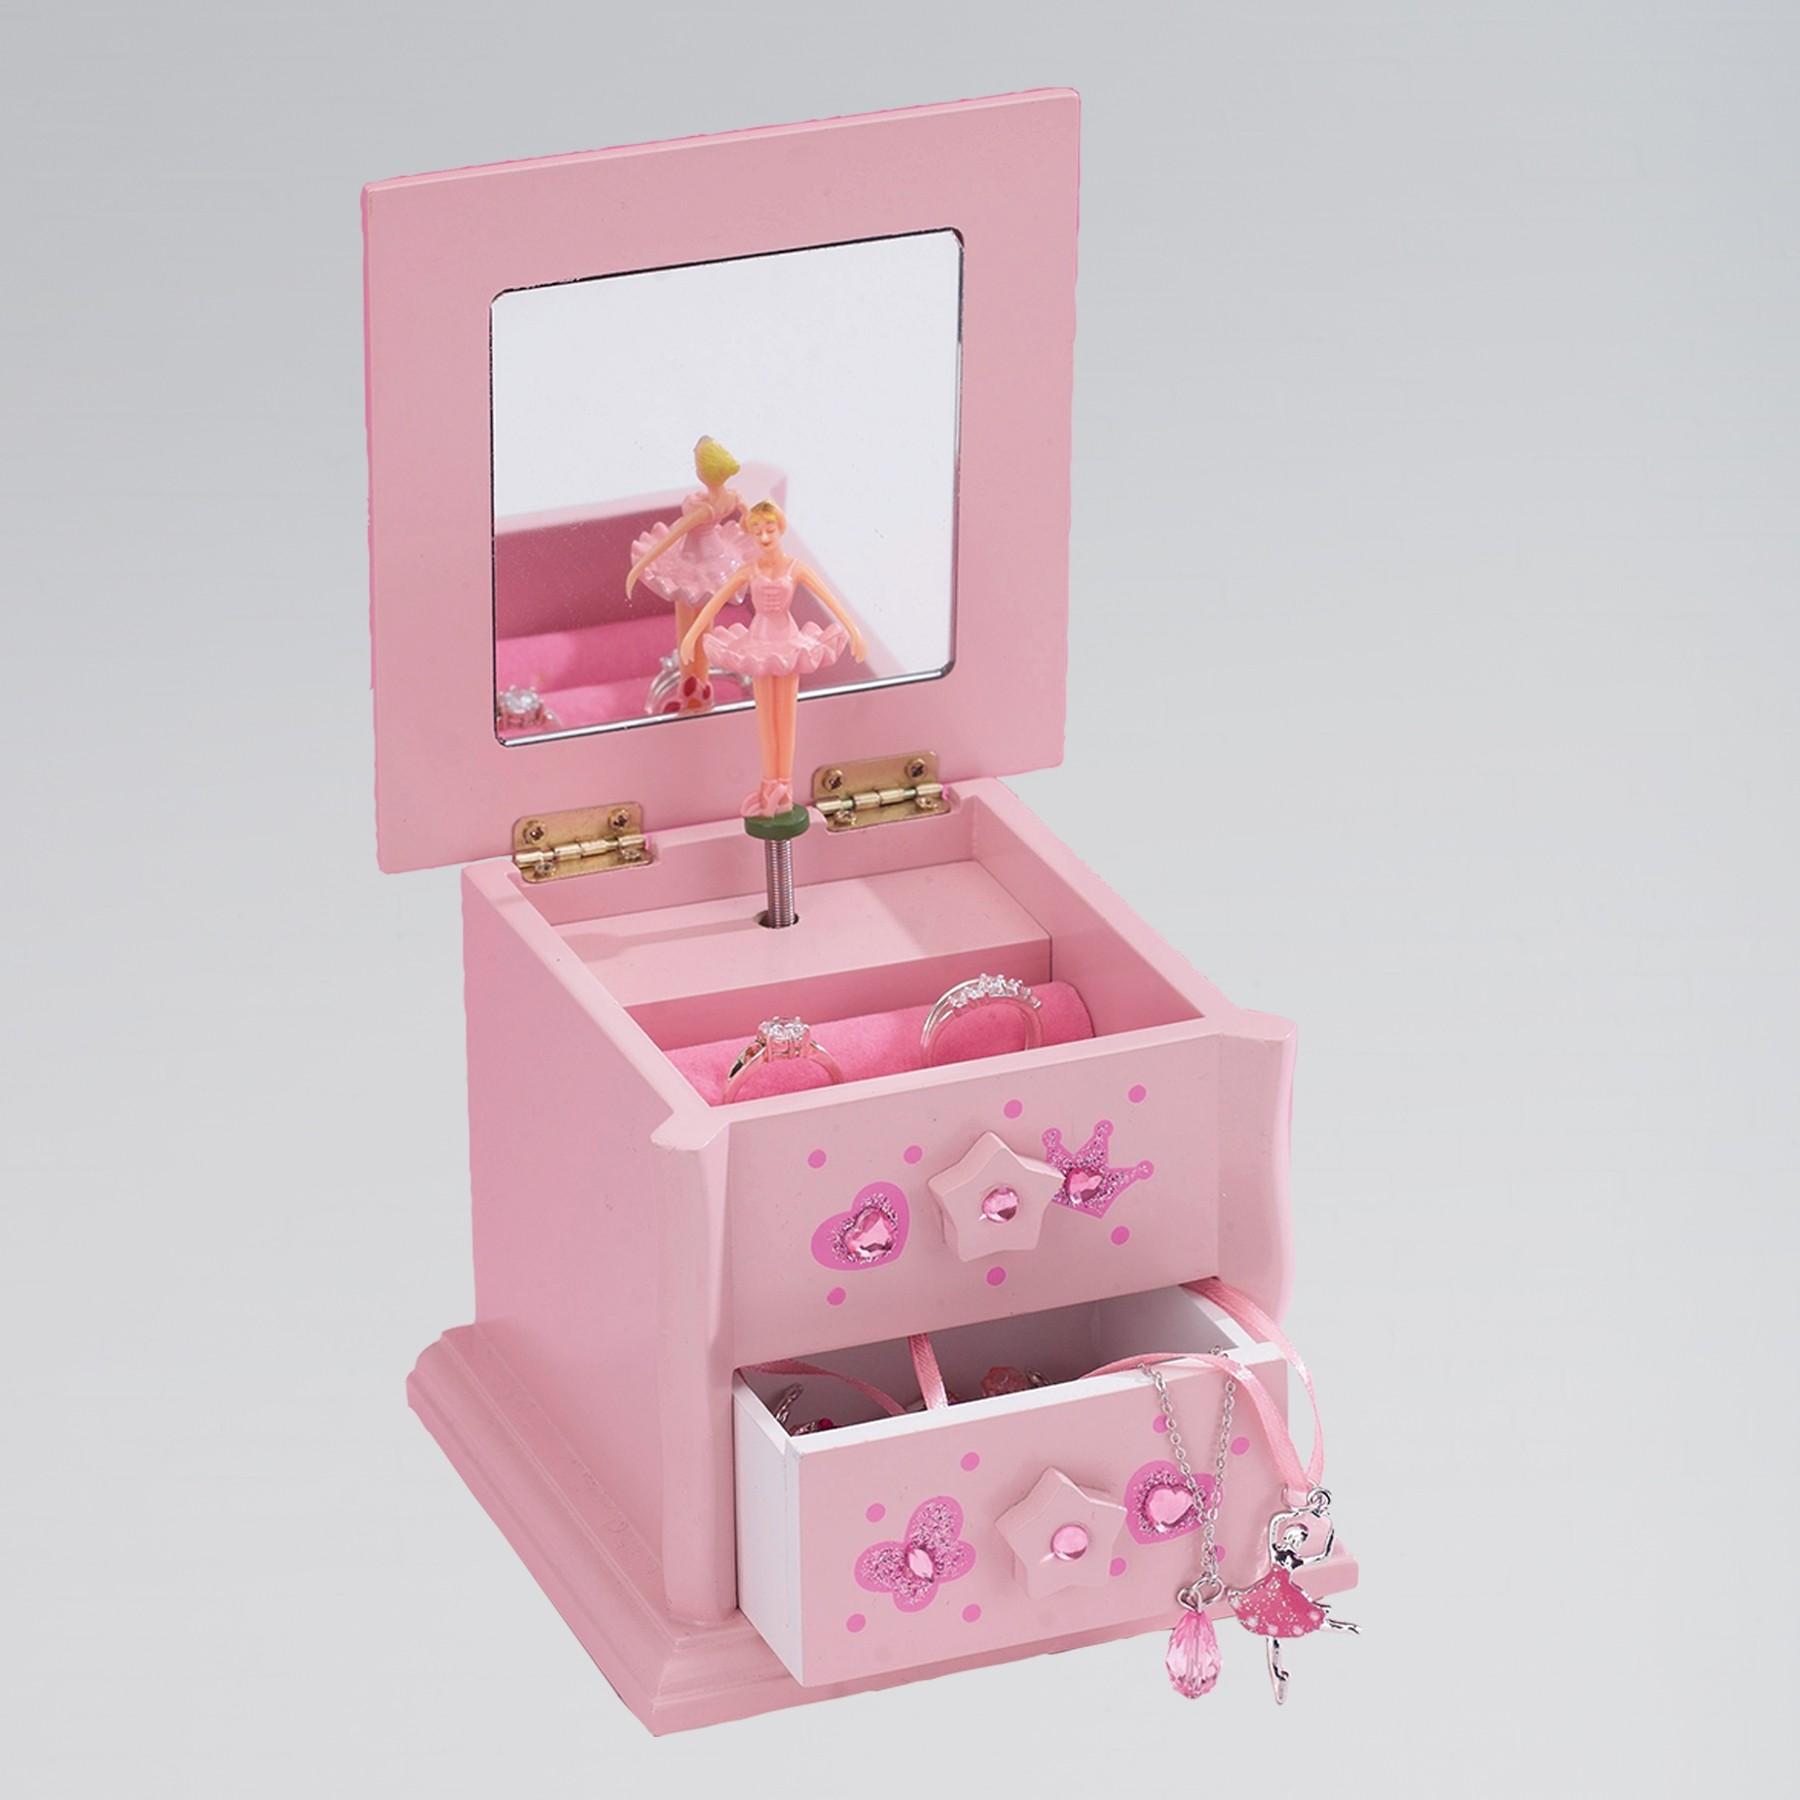 Katz Small Wooden 2 Drawer Jewellery Box